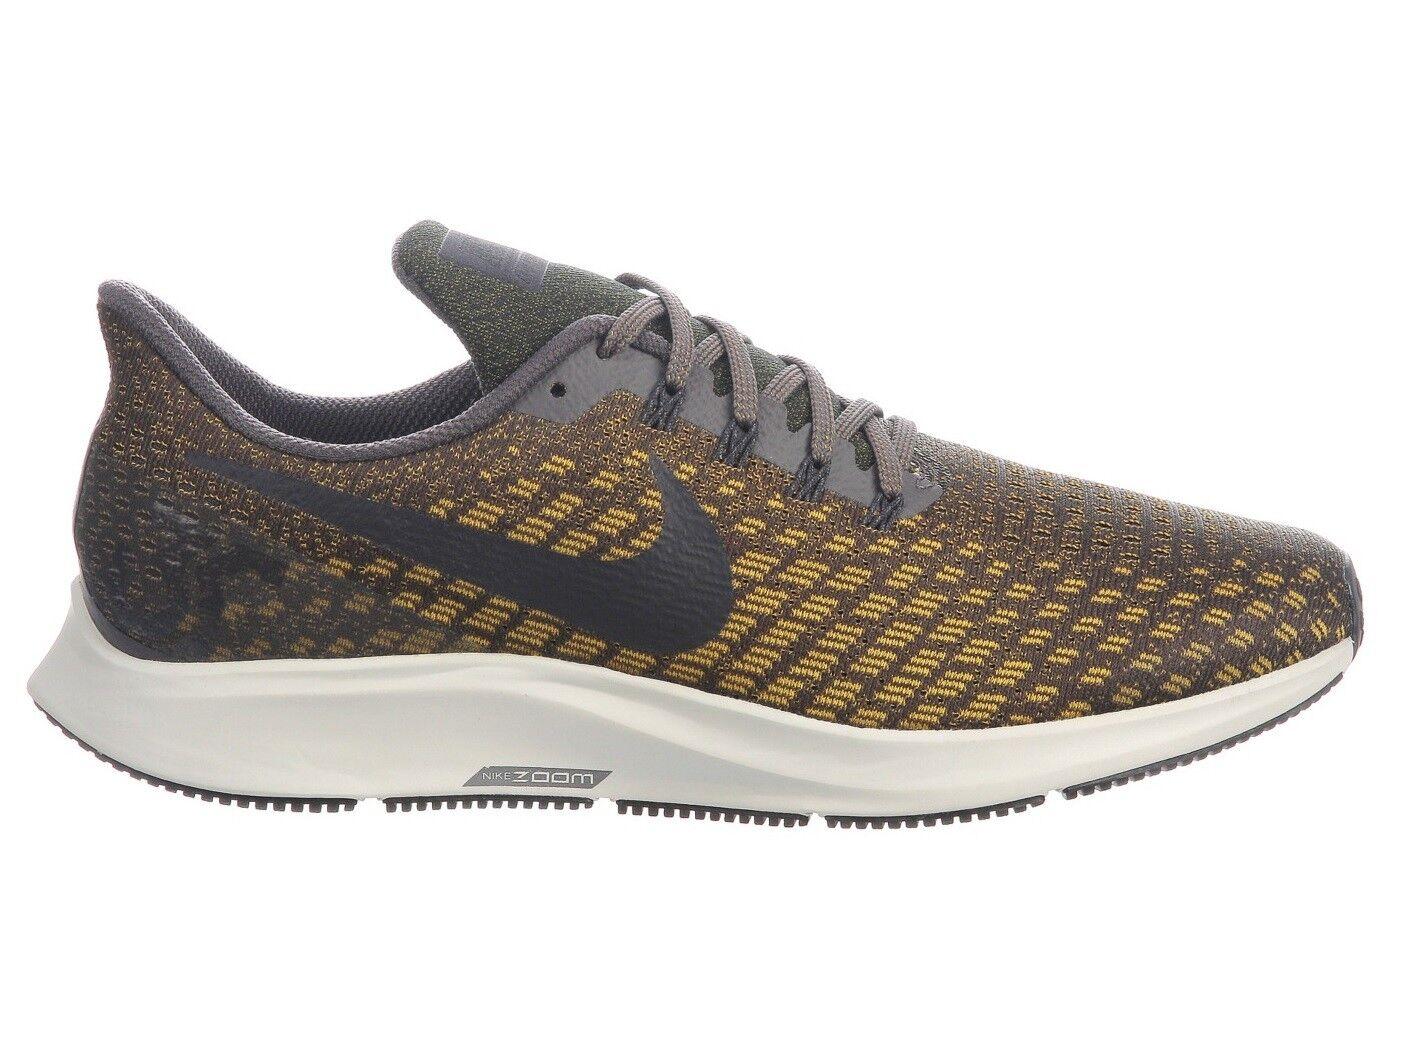 Nike Air Zoom Pegasus 35 Mens 942851-007 Grey Citron Mesh Running shoes Size 10